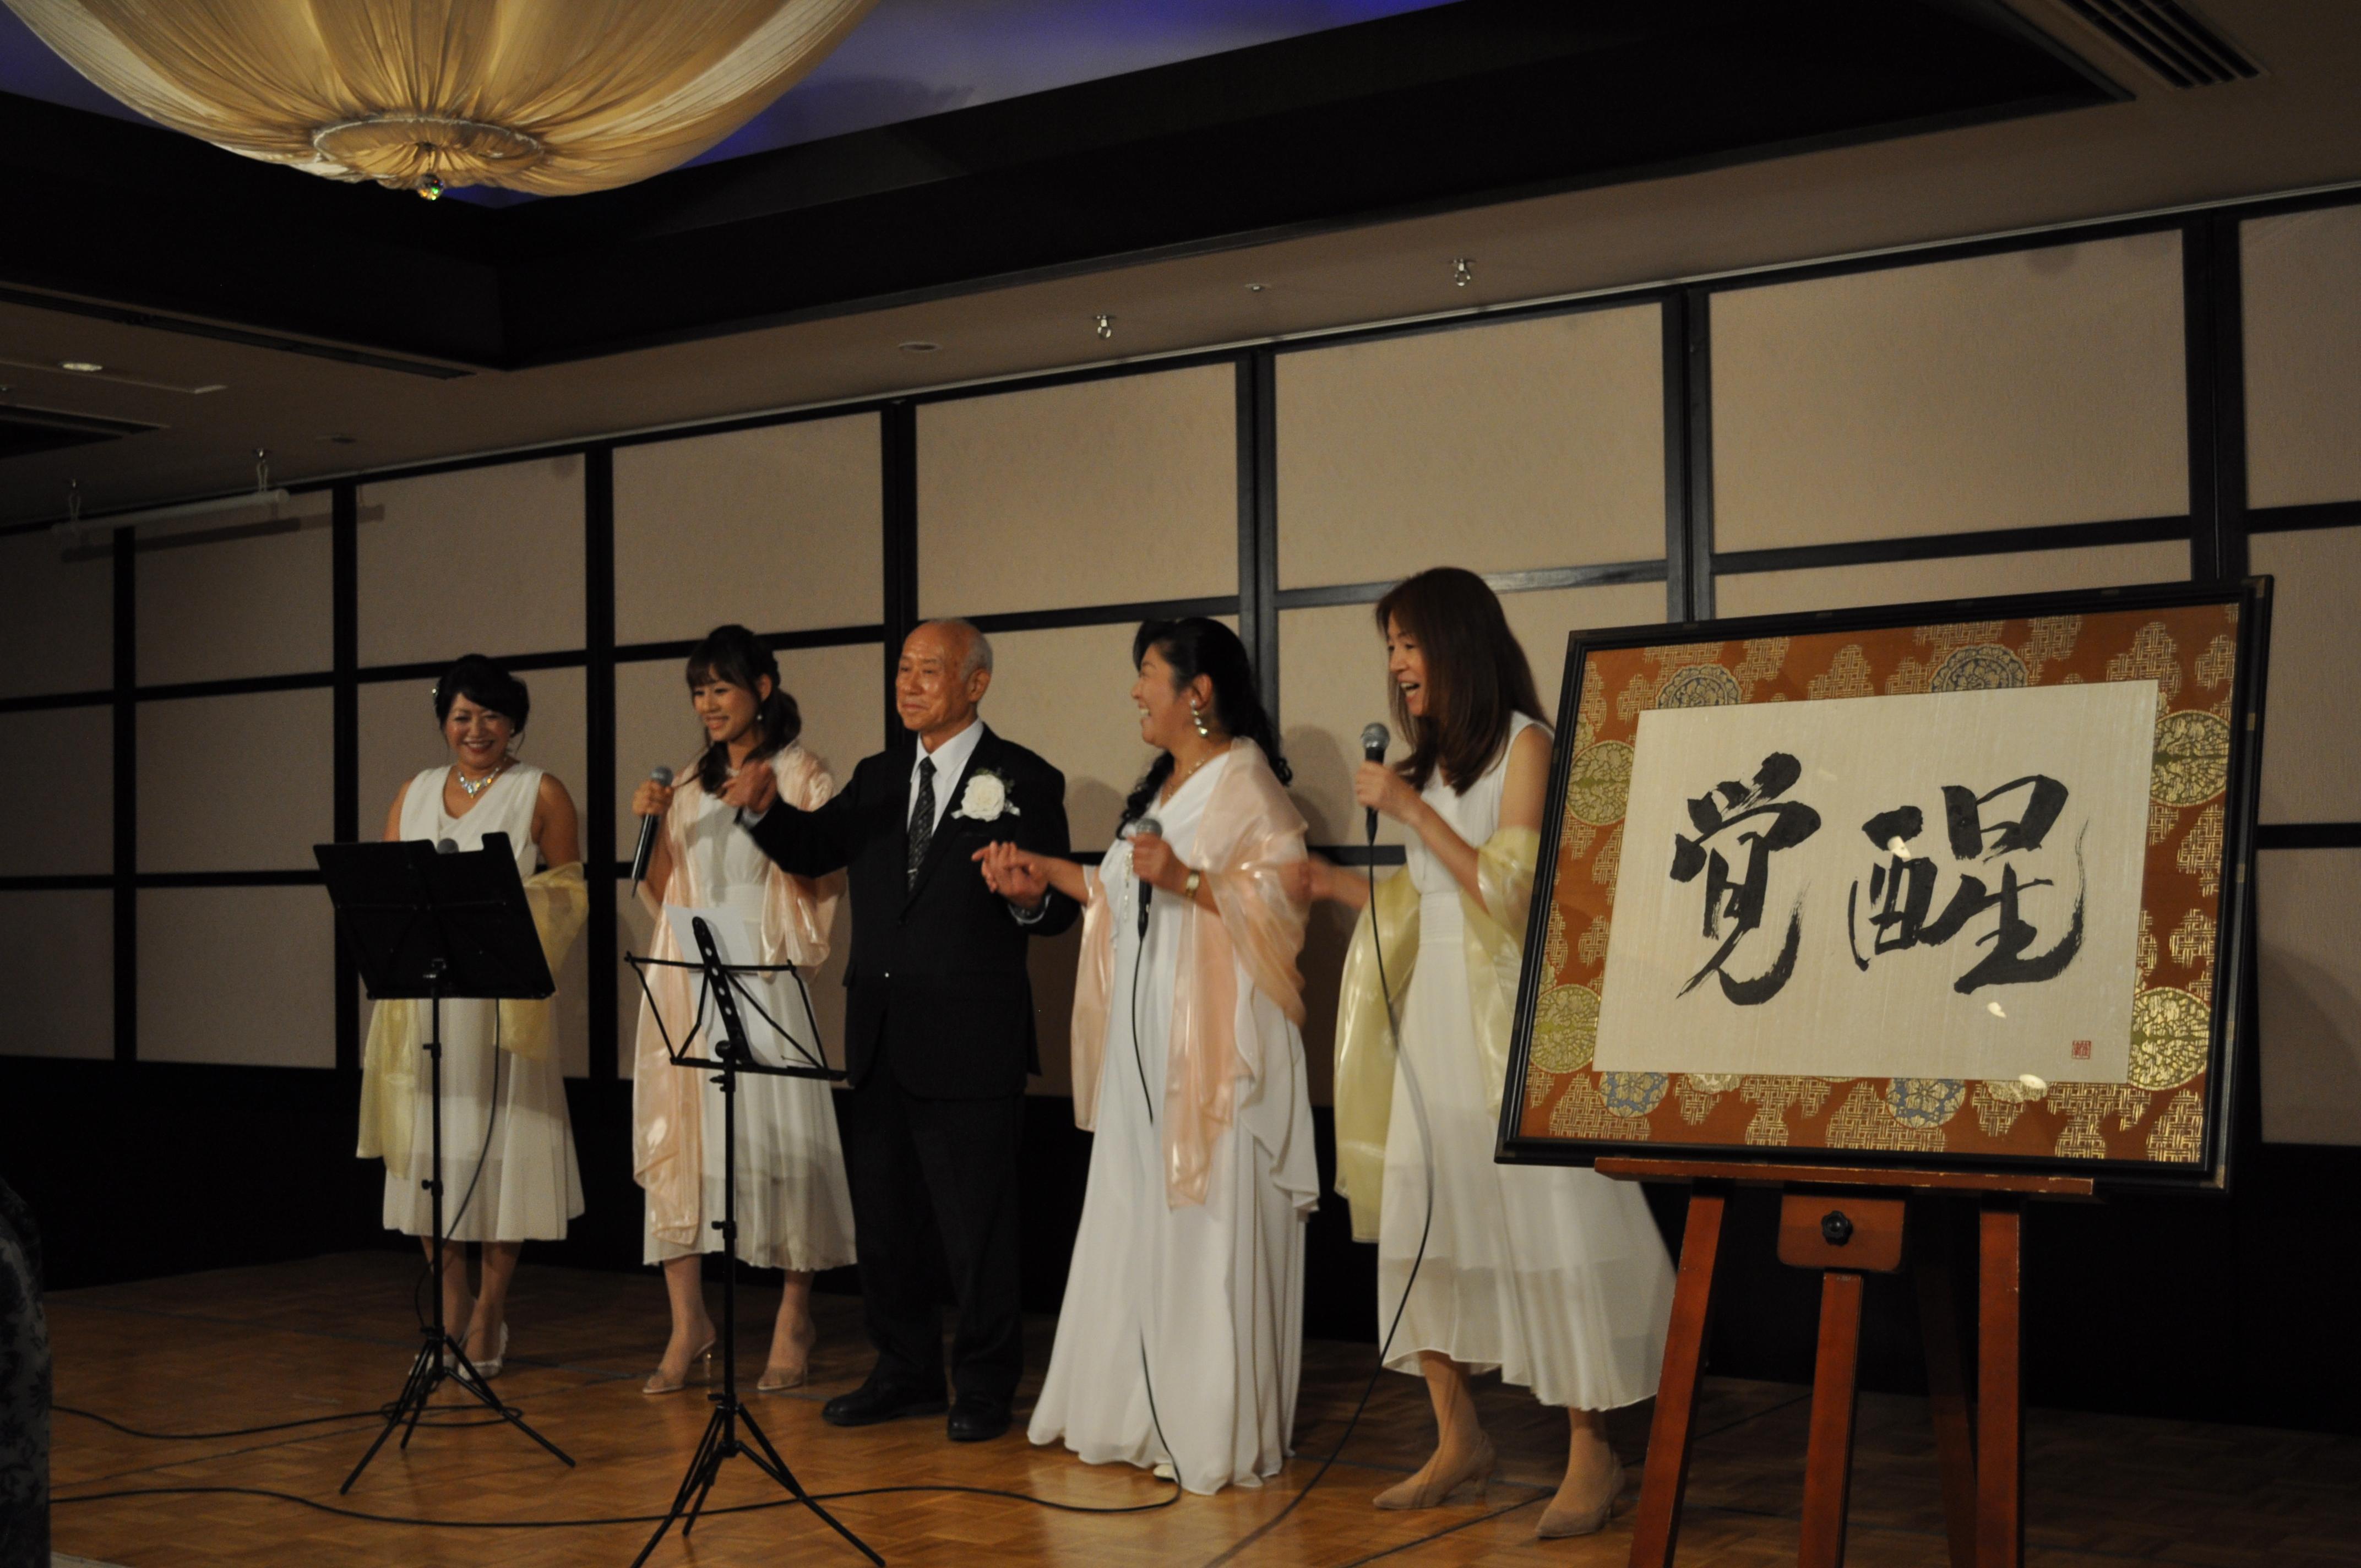 DSC 0533 - 第6回思風会全国大会2018in東京開催